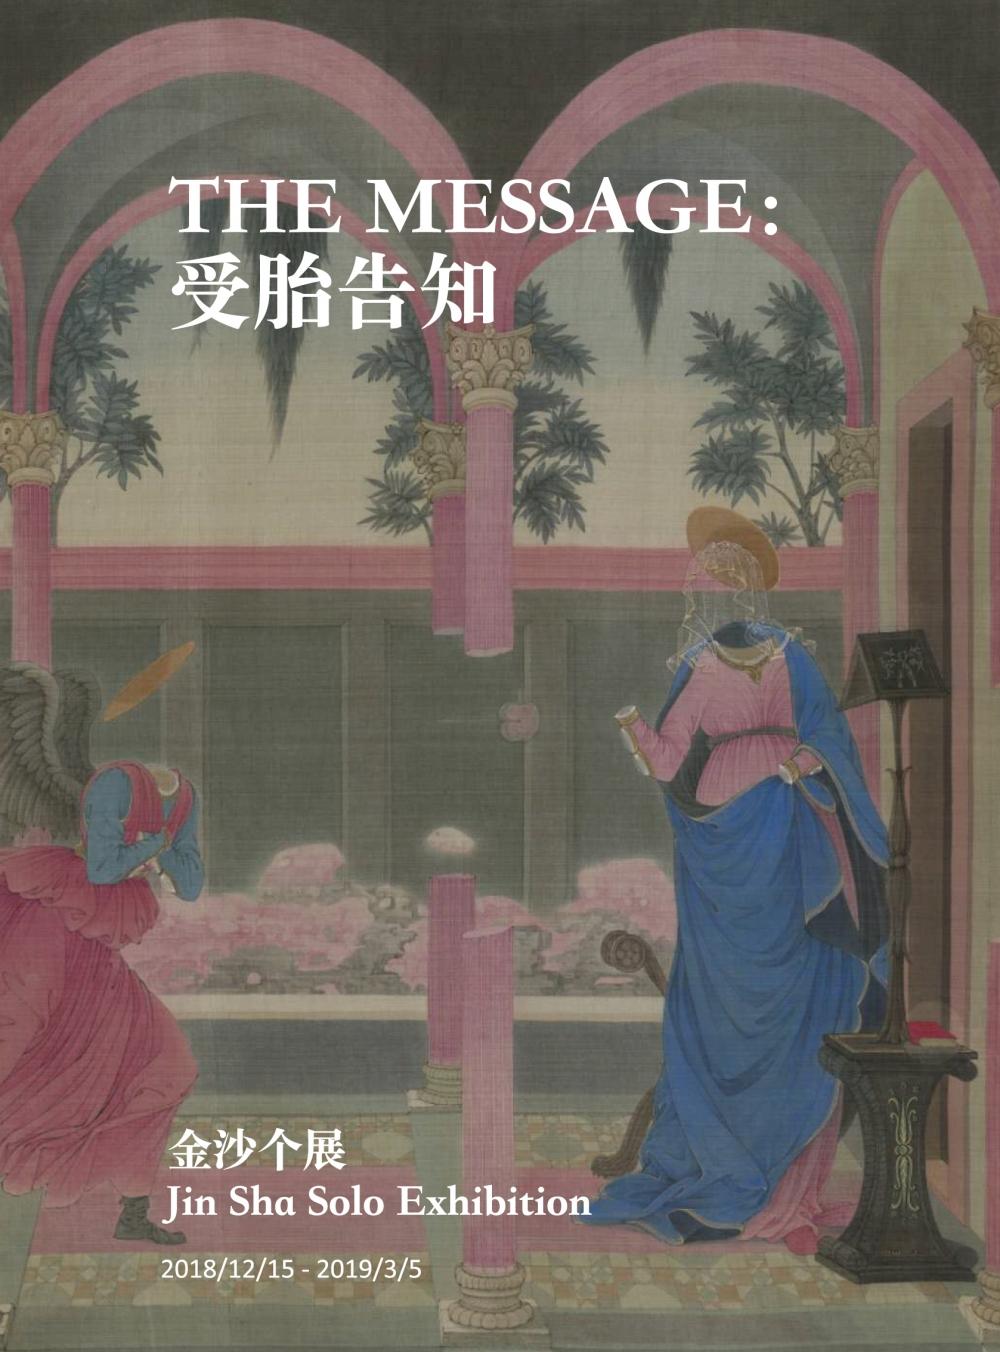 金沙:受胎告知 Jin Sha: The Message